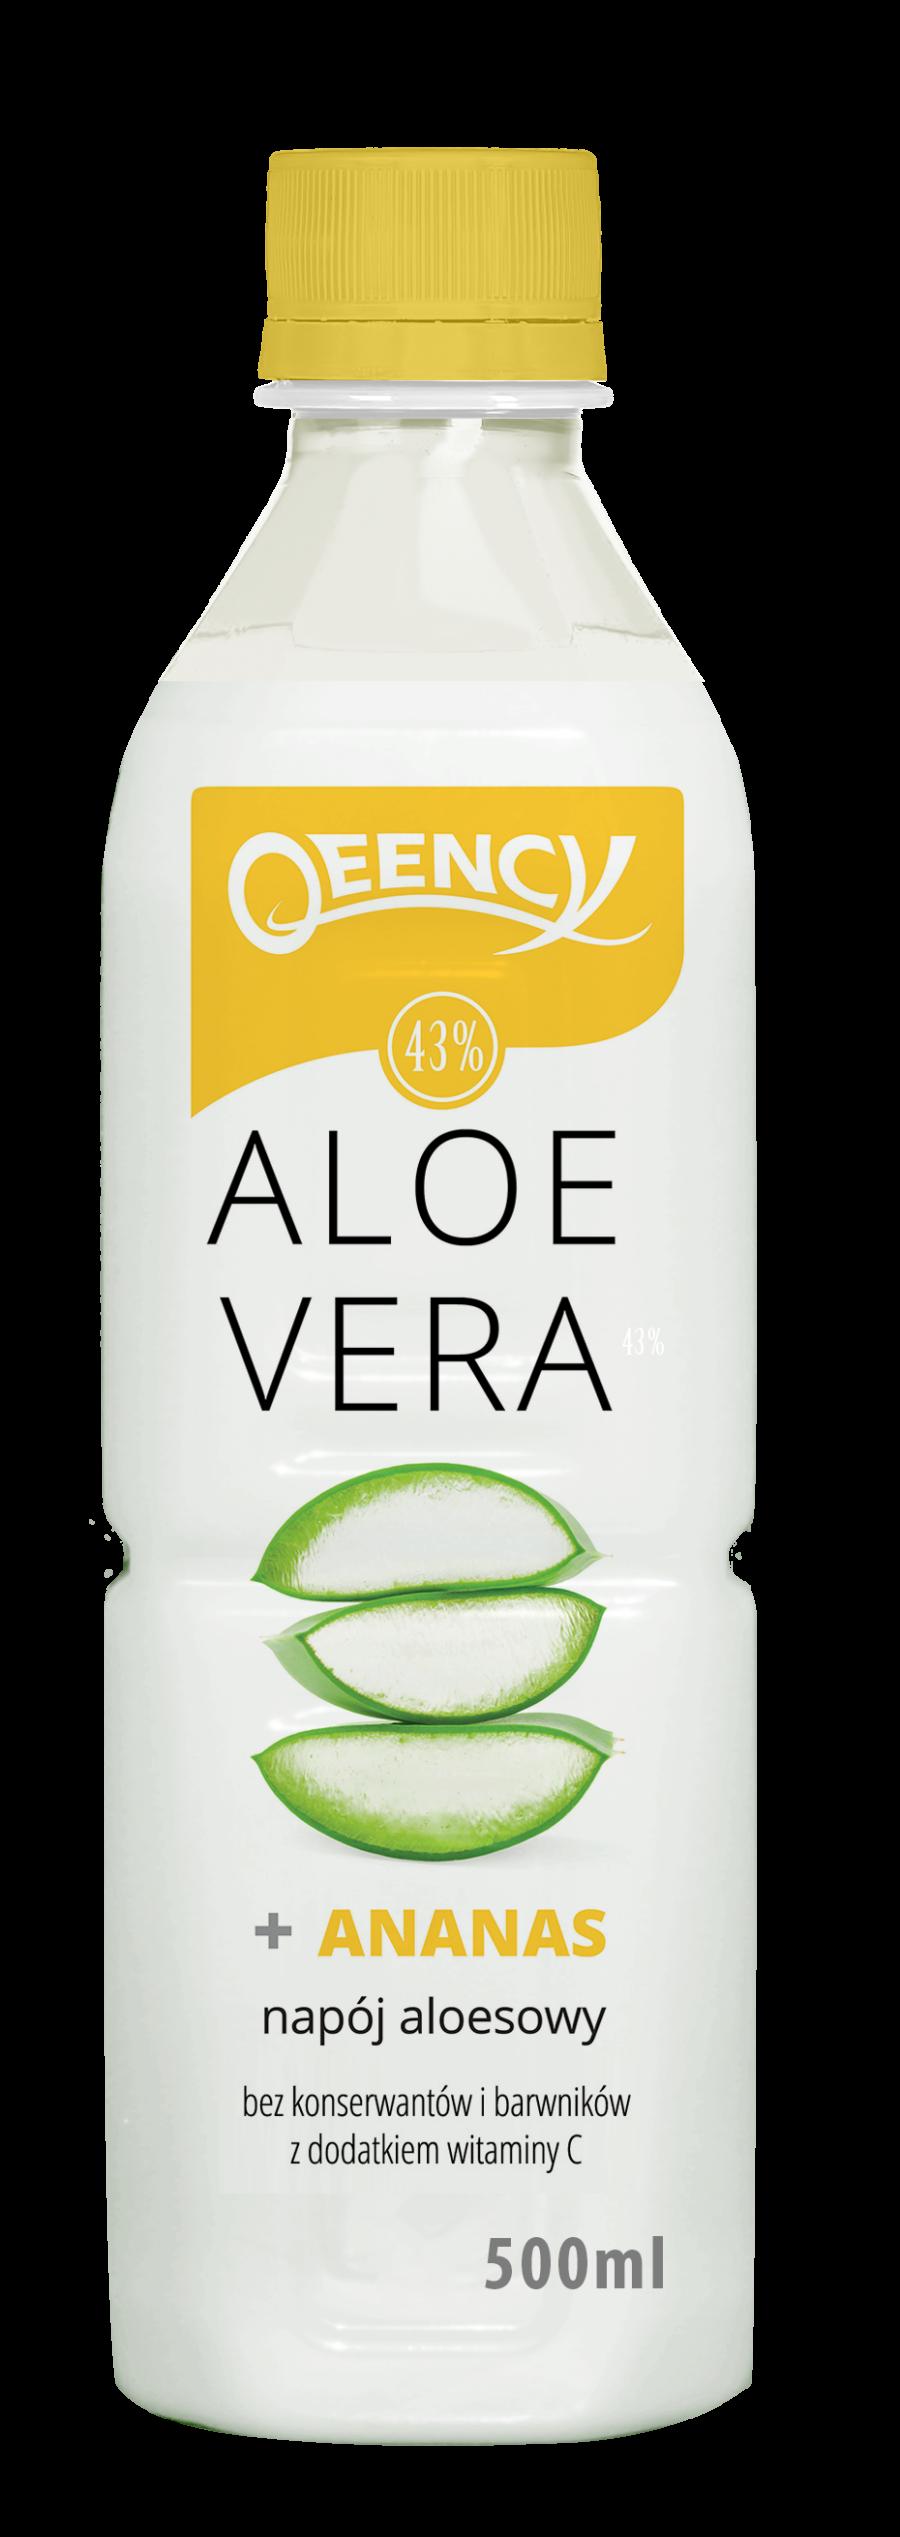 qeency napoj aloesowy ananas